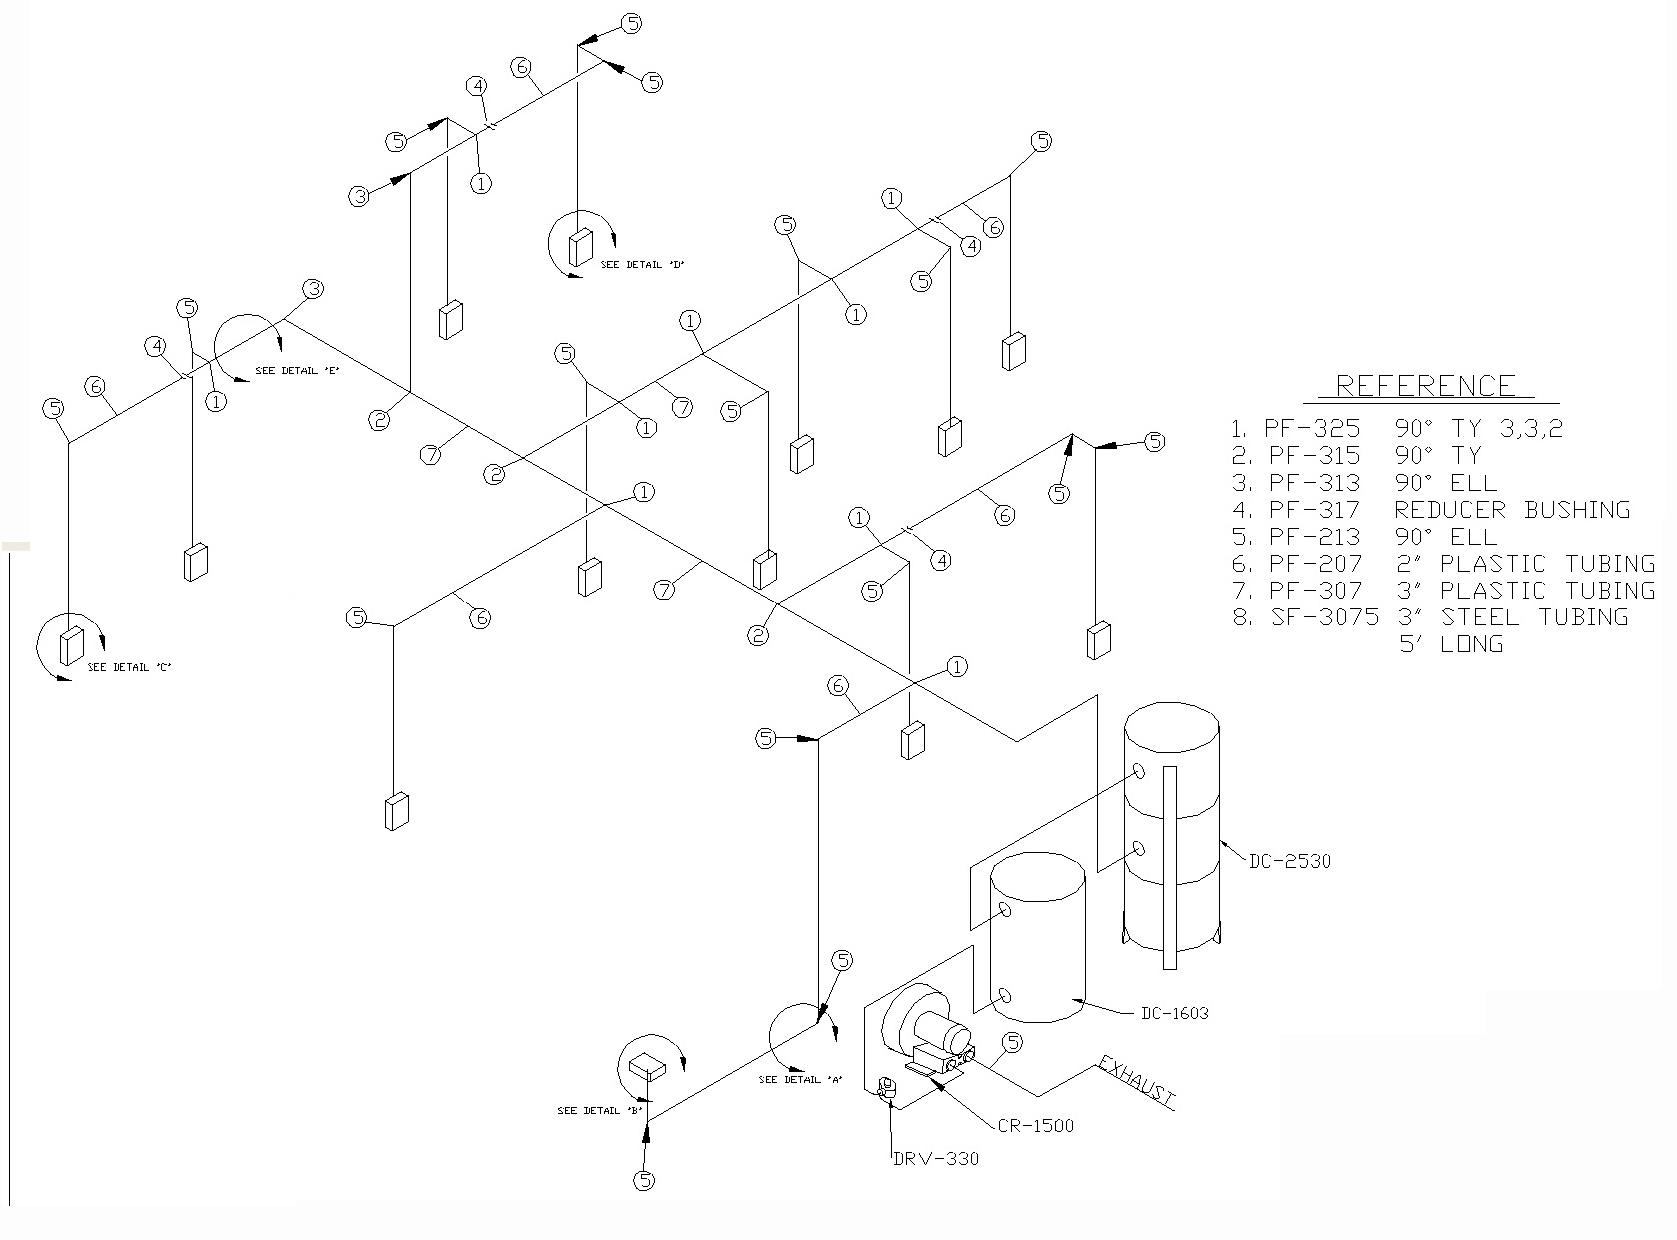 Commercial Vacuum System Design Manufacturer Of Vacumaid